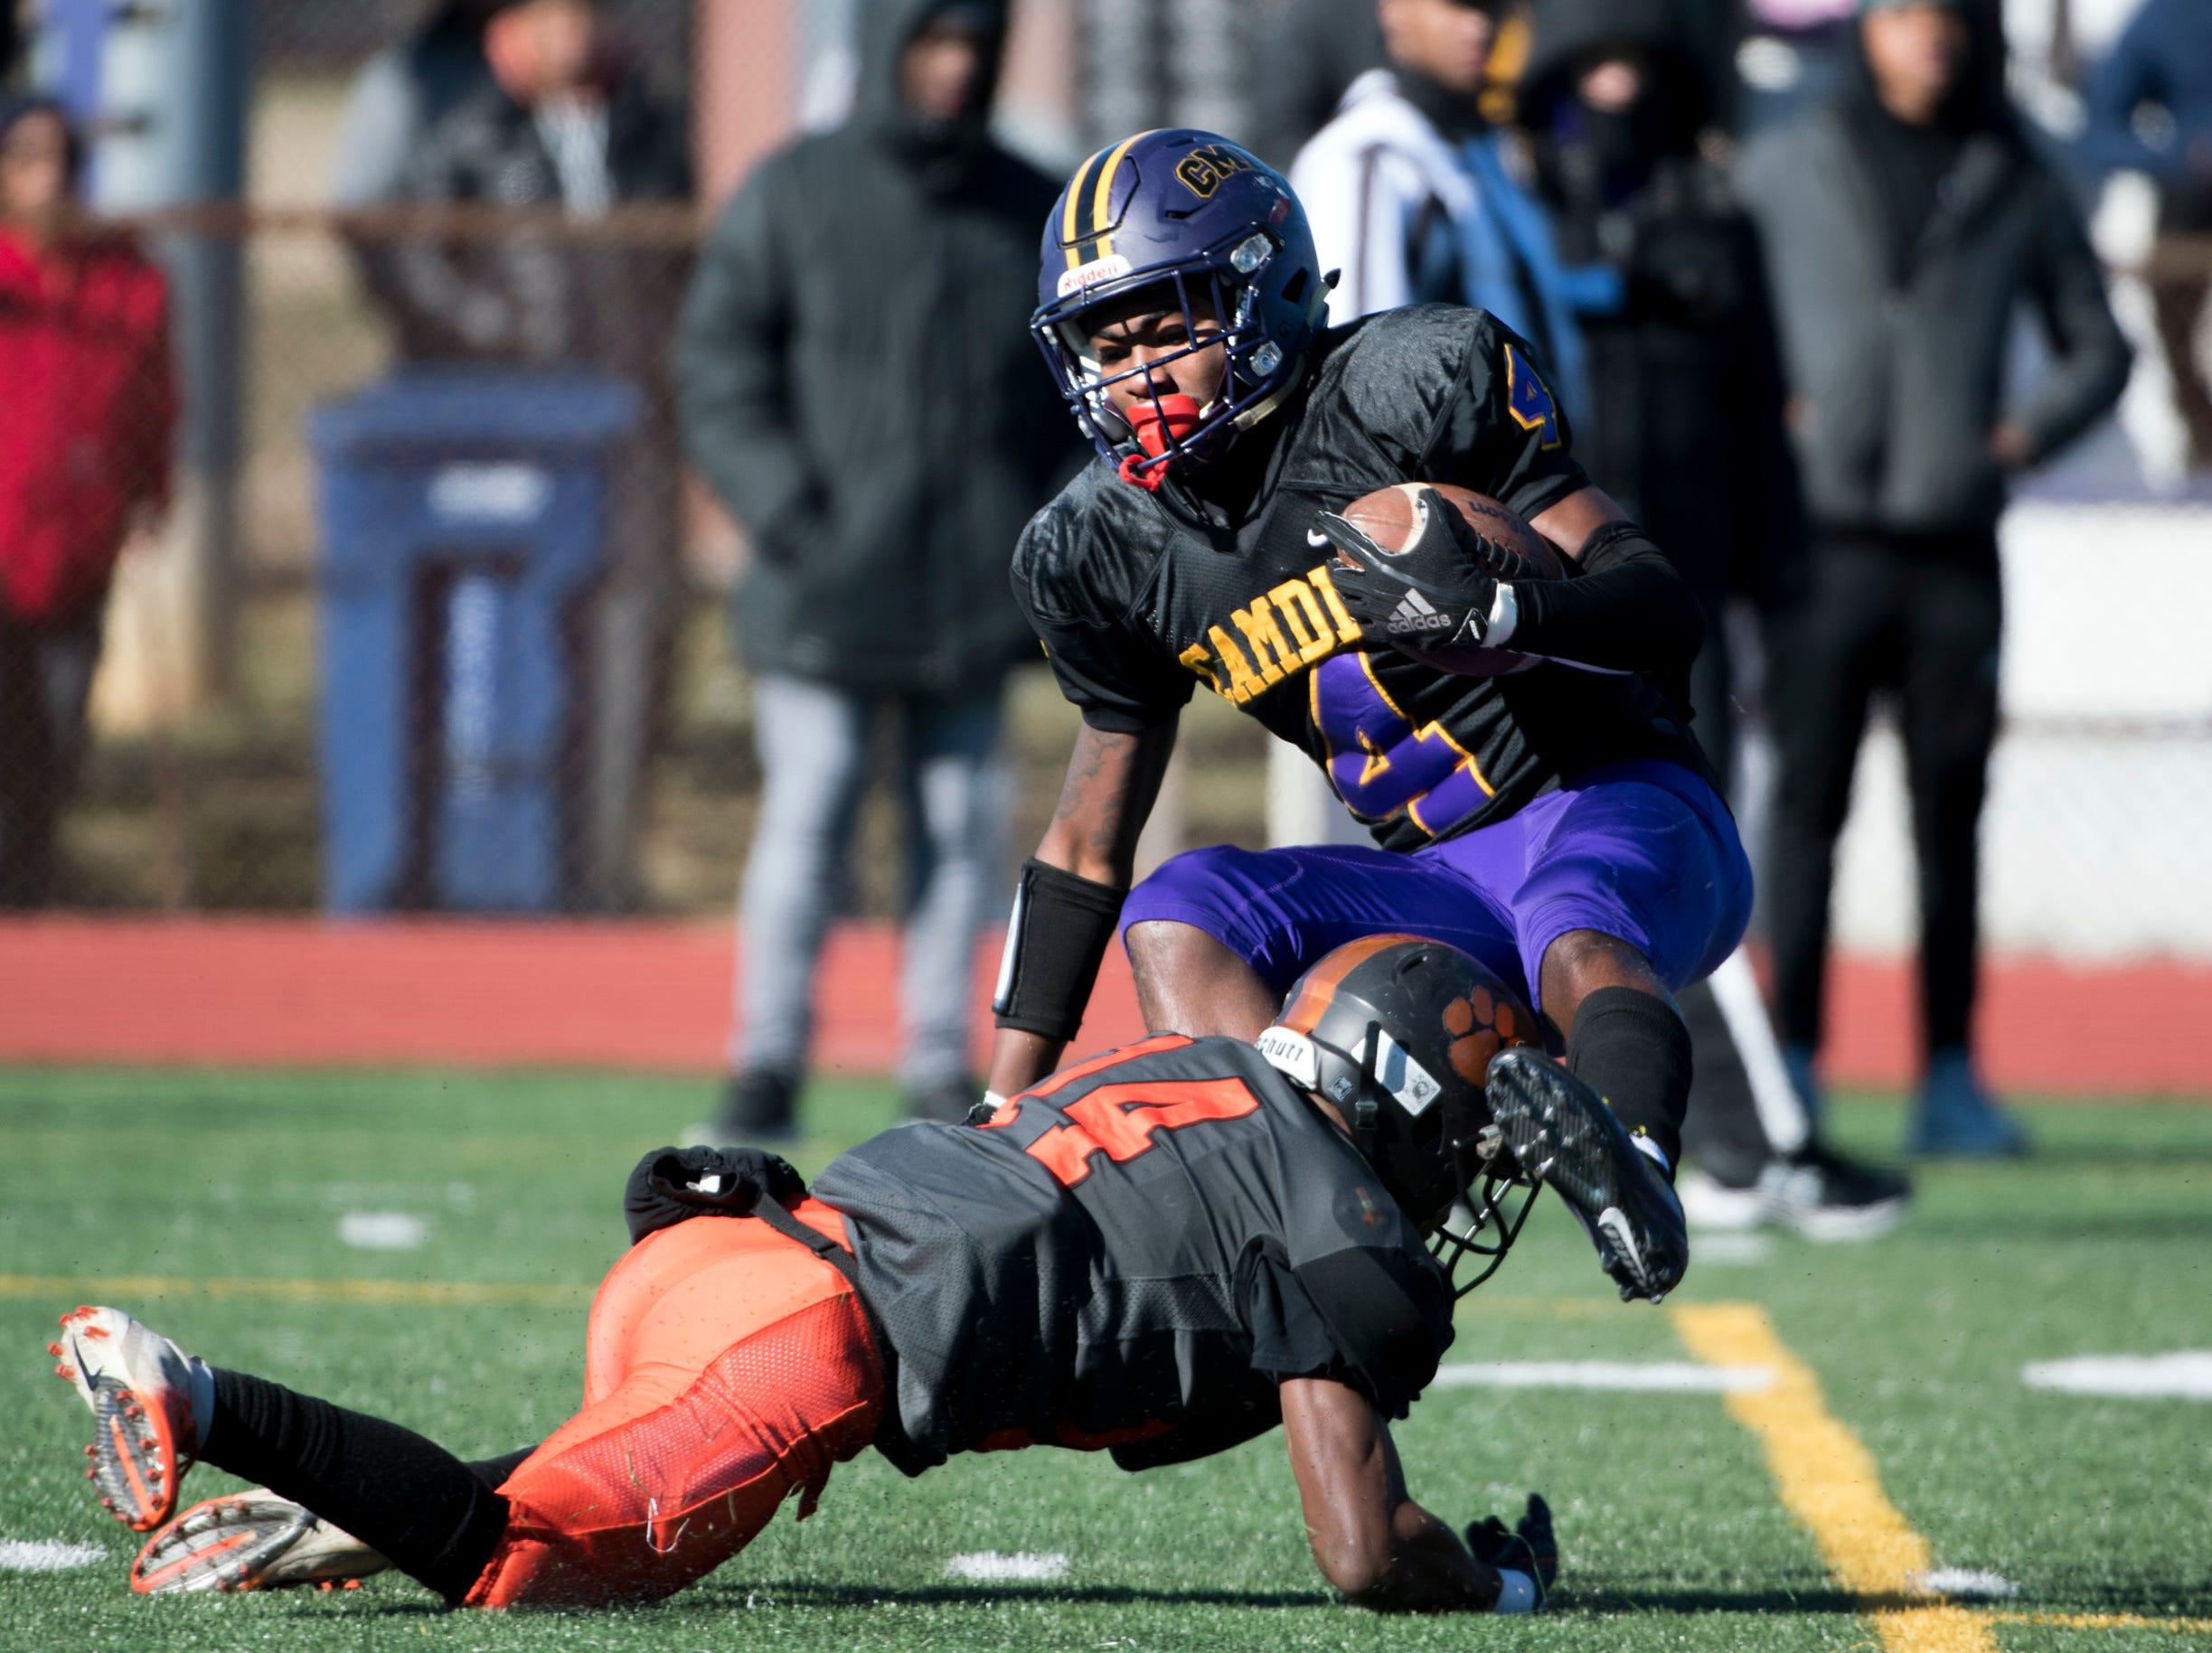 Camden's Jajuan Hudson (4) is tackled during an annual Camden-Woodrow Wilson Thanksgiving game Thursday, Nov. 22, 2018 in Camden, N.J. Camden won 39-28.